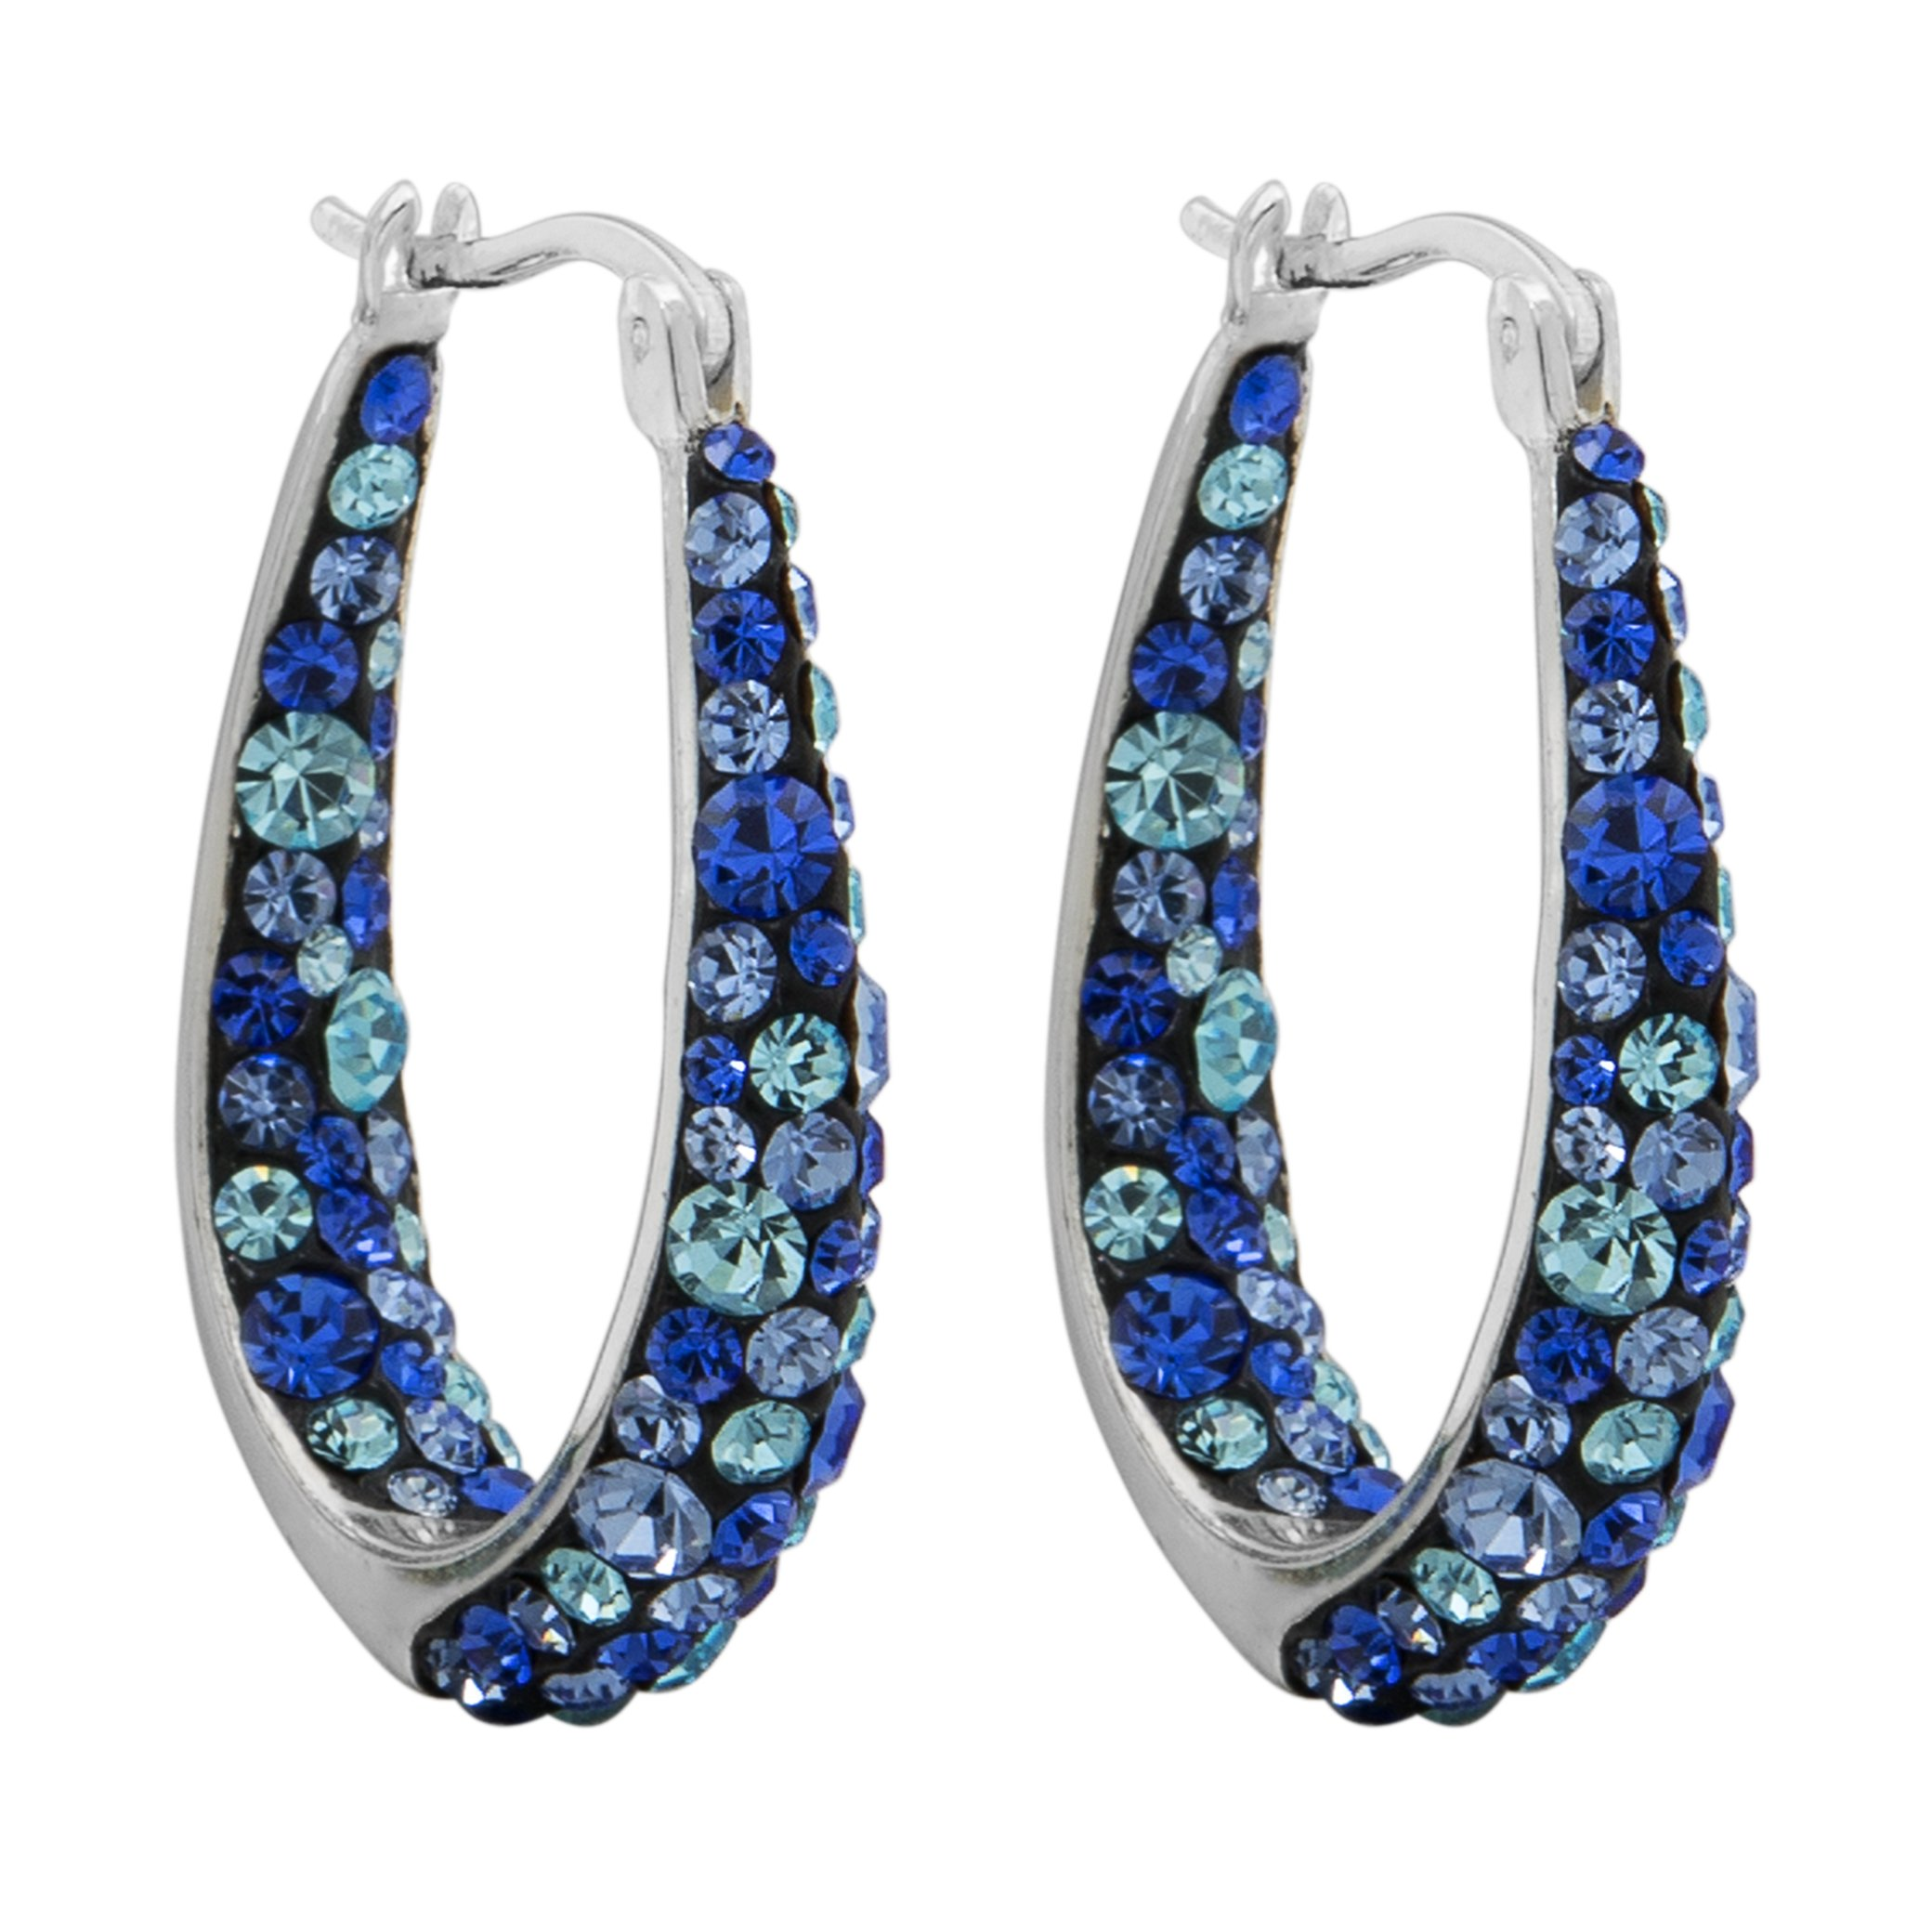 Crystalogy Silver Plated Multi Blue Crystal Inside Out Oval Shape Hoop Earrings, 1.2 Inch